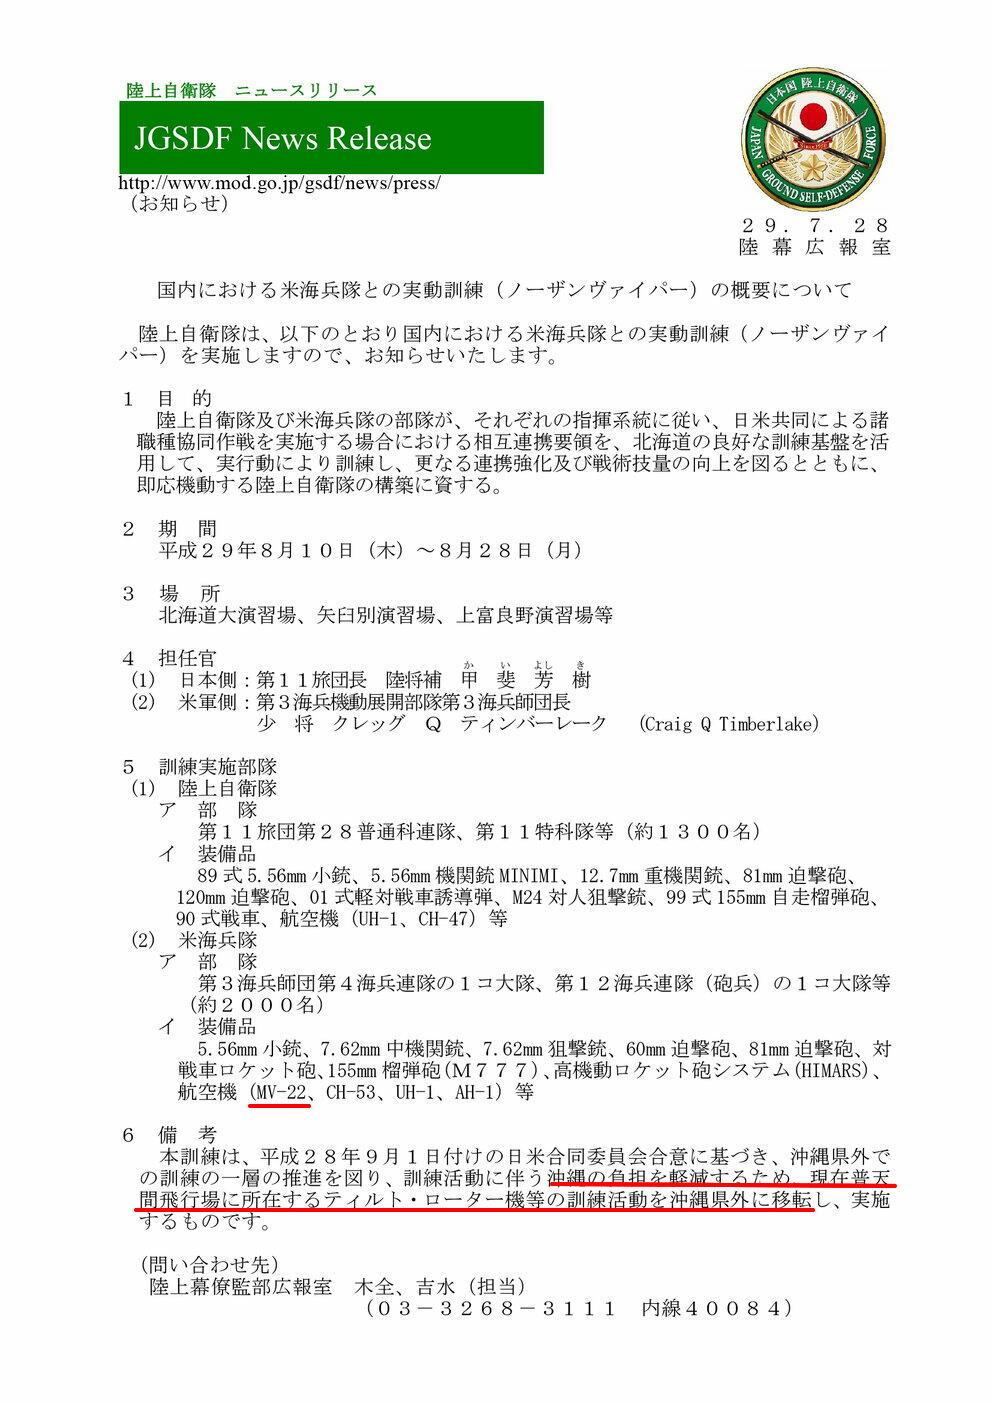 JGSDF報道資料2017 07282